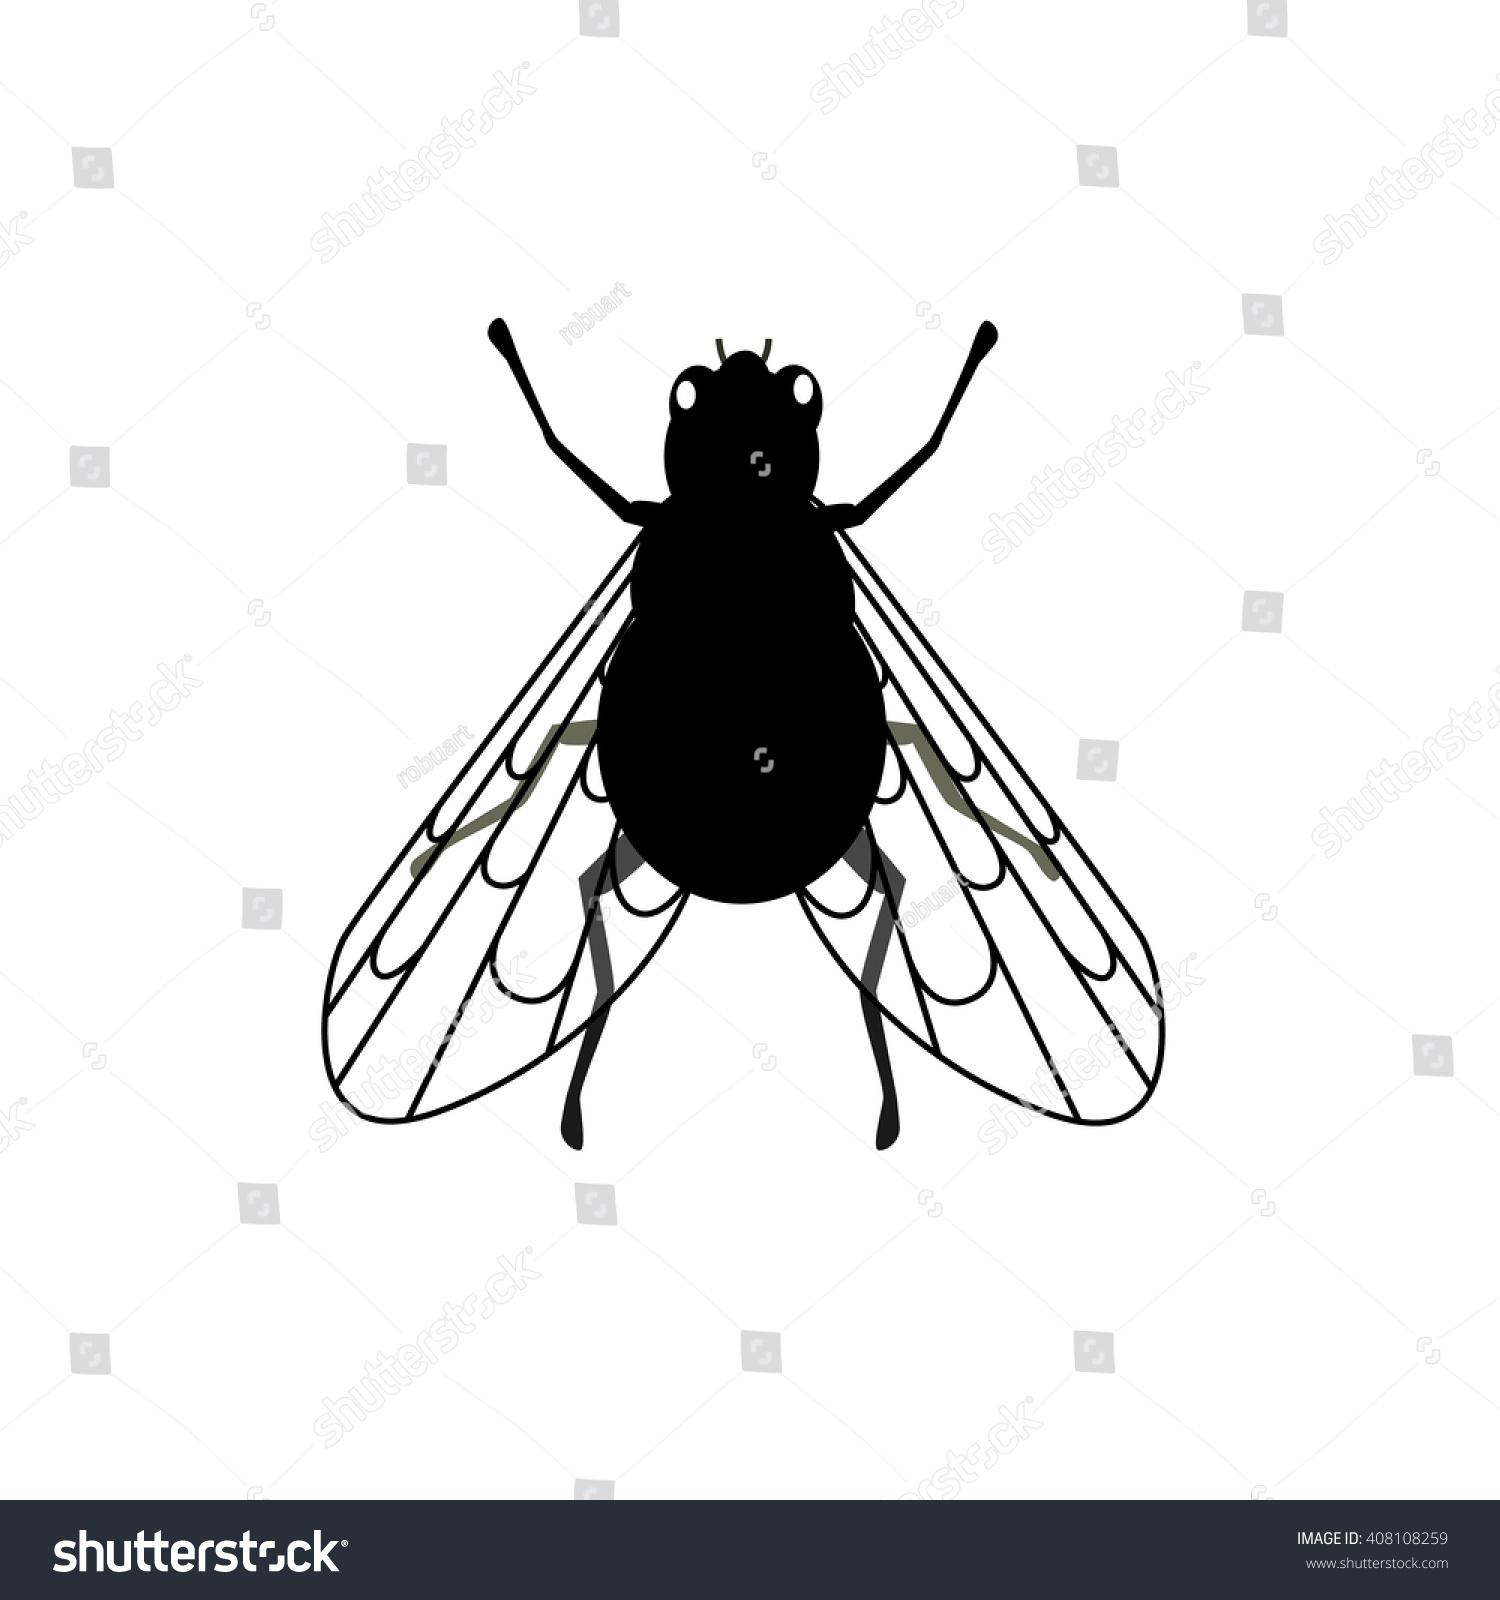 Small Black Flies In Kitchen Cheap 2 Bedroom Townhomes Makrillarnacom